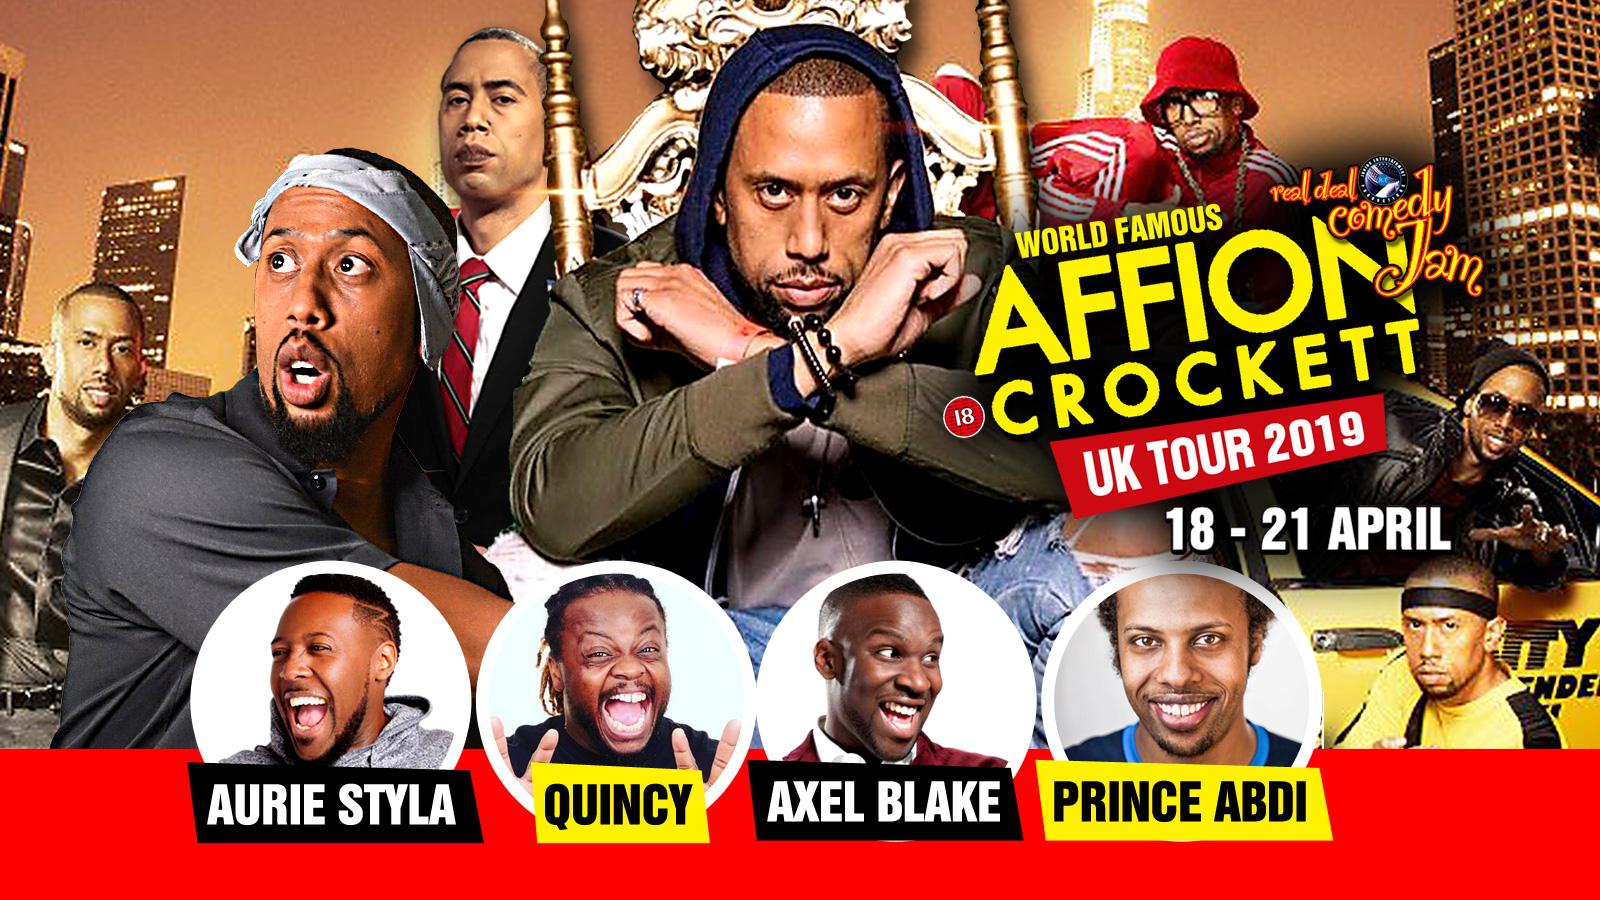 Affion Crockett Live in Birmingham – Real Deal Comedy Jam Tour